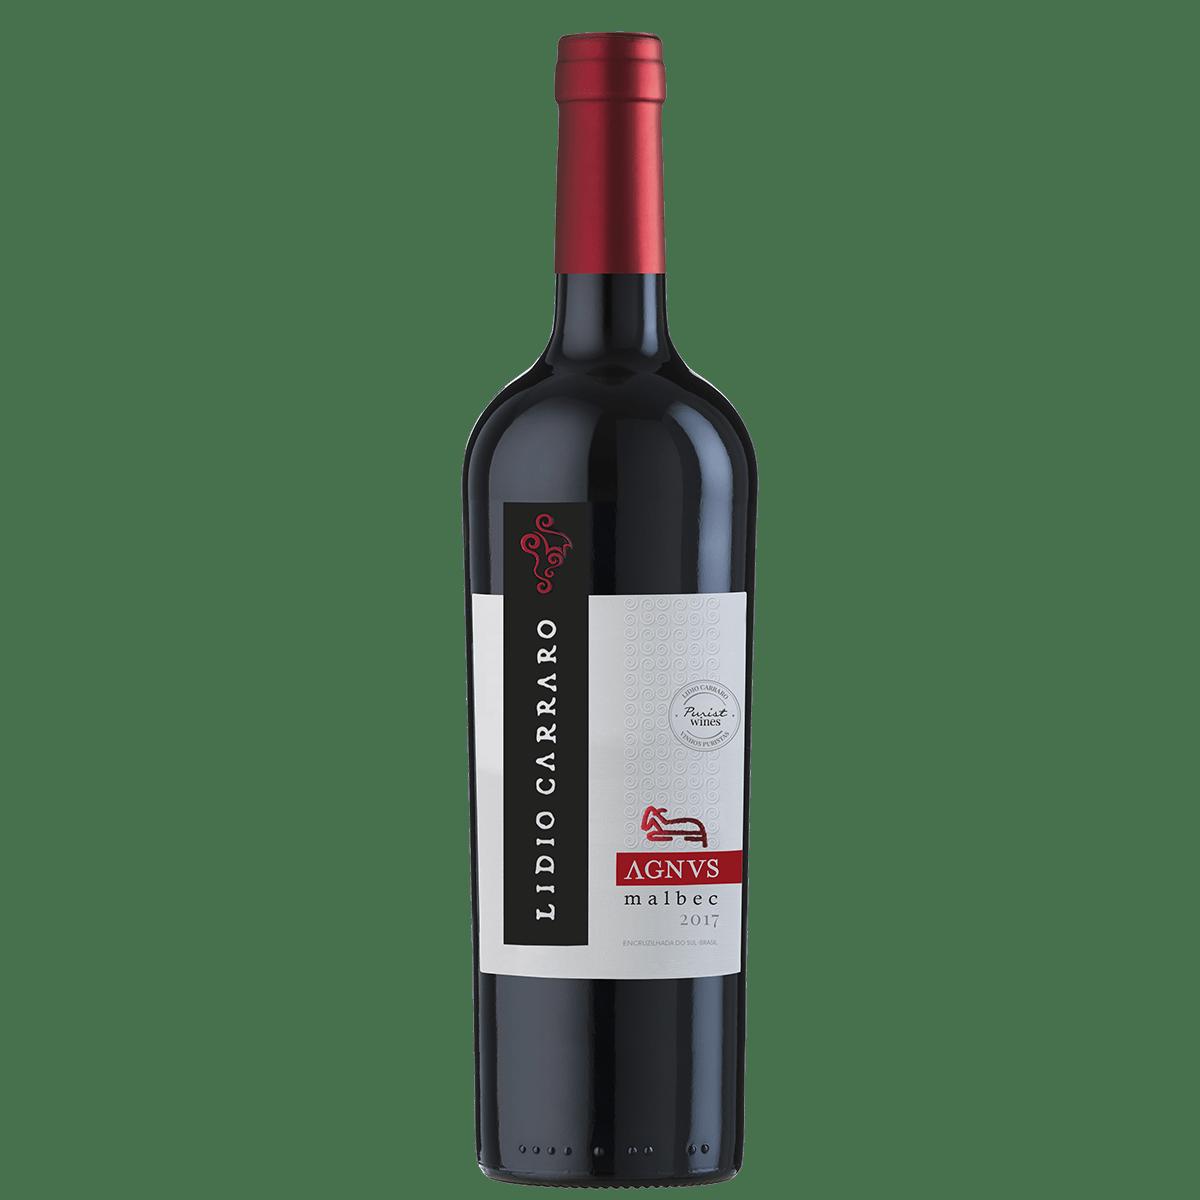 Vinho Lidio Carraro Agnus Malbec Tinto Seco 750ml